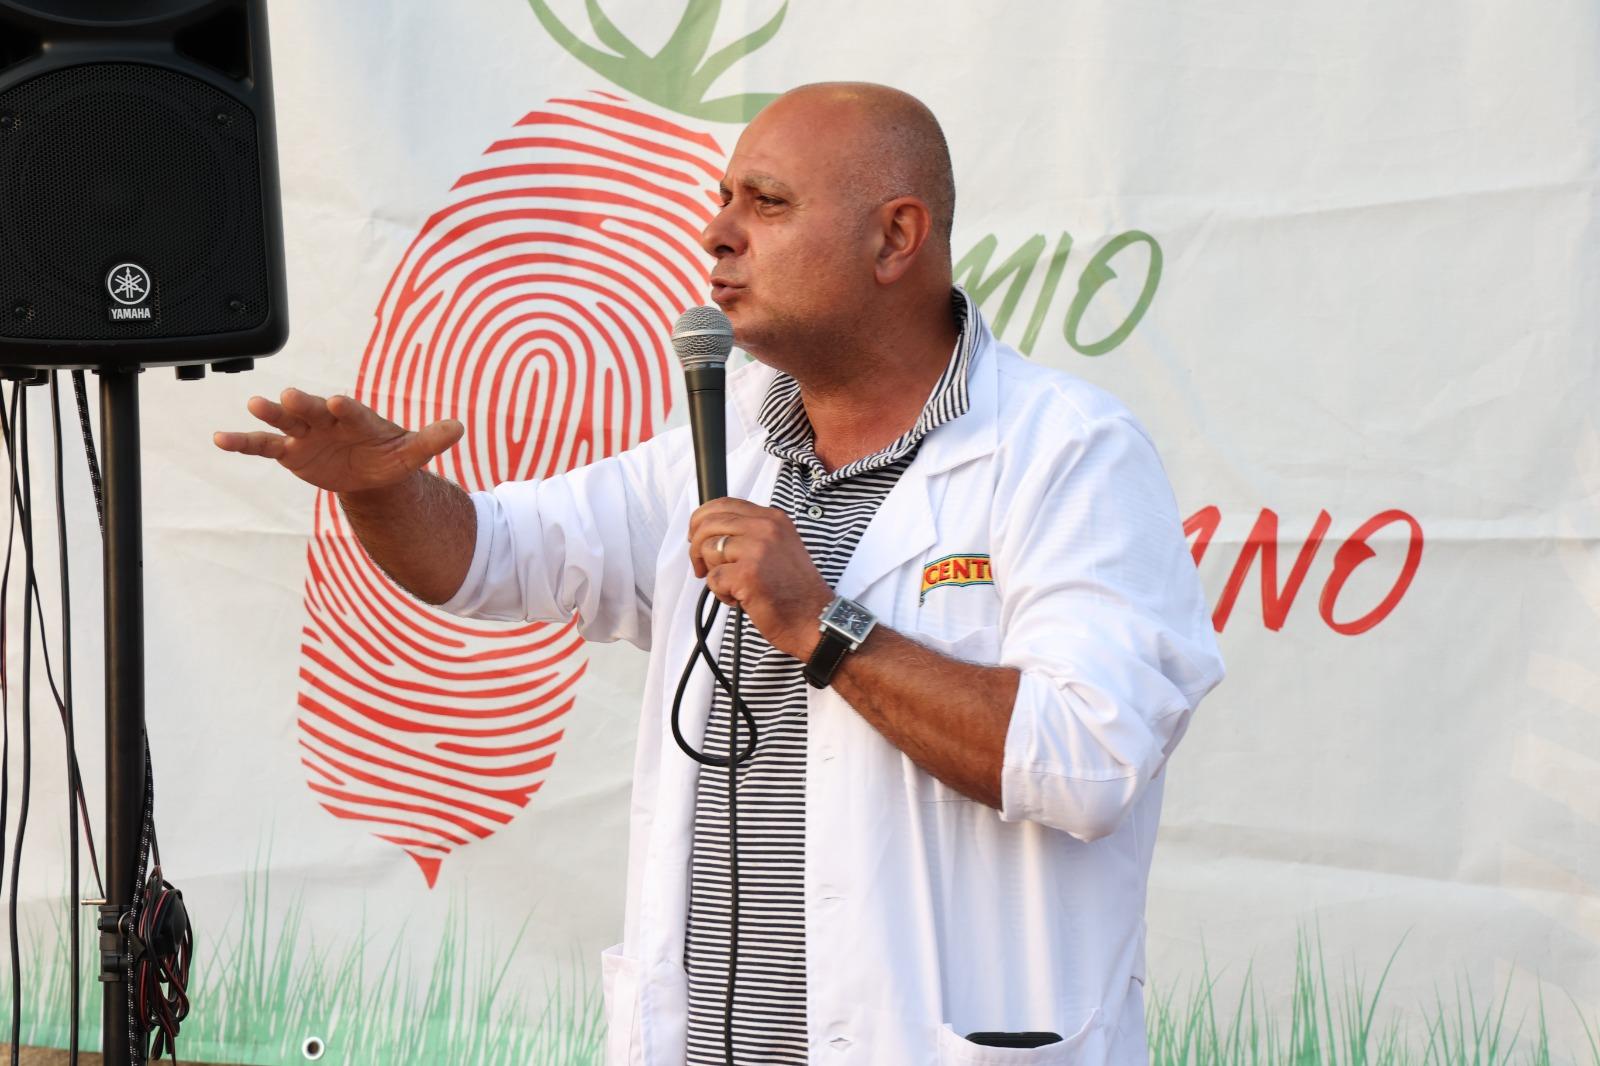 Giuseppe Napoletano